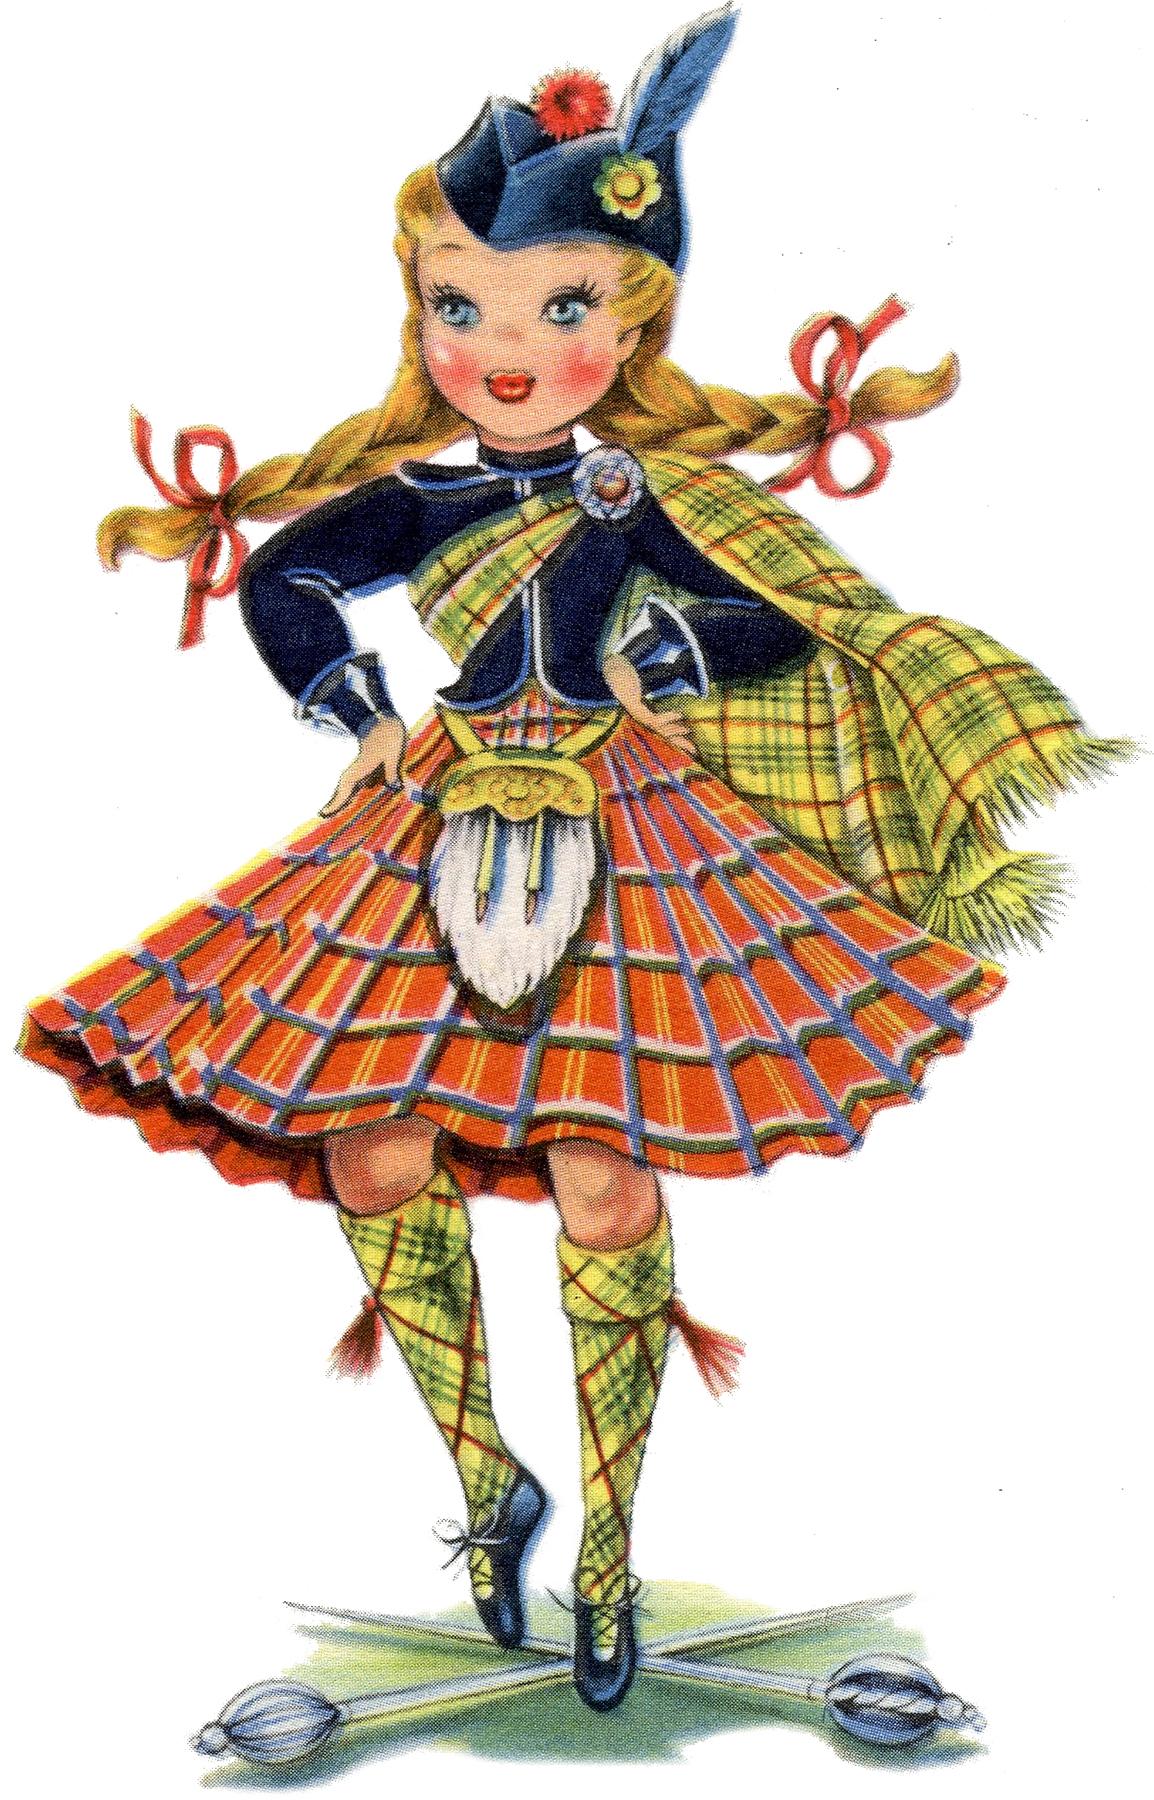 Adorable Retro Scottish Doll Image The Graphics Fairy